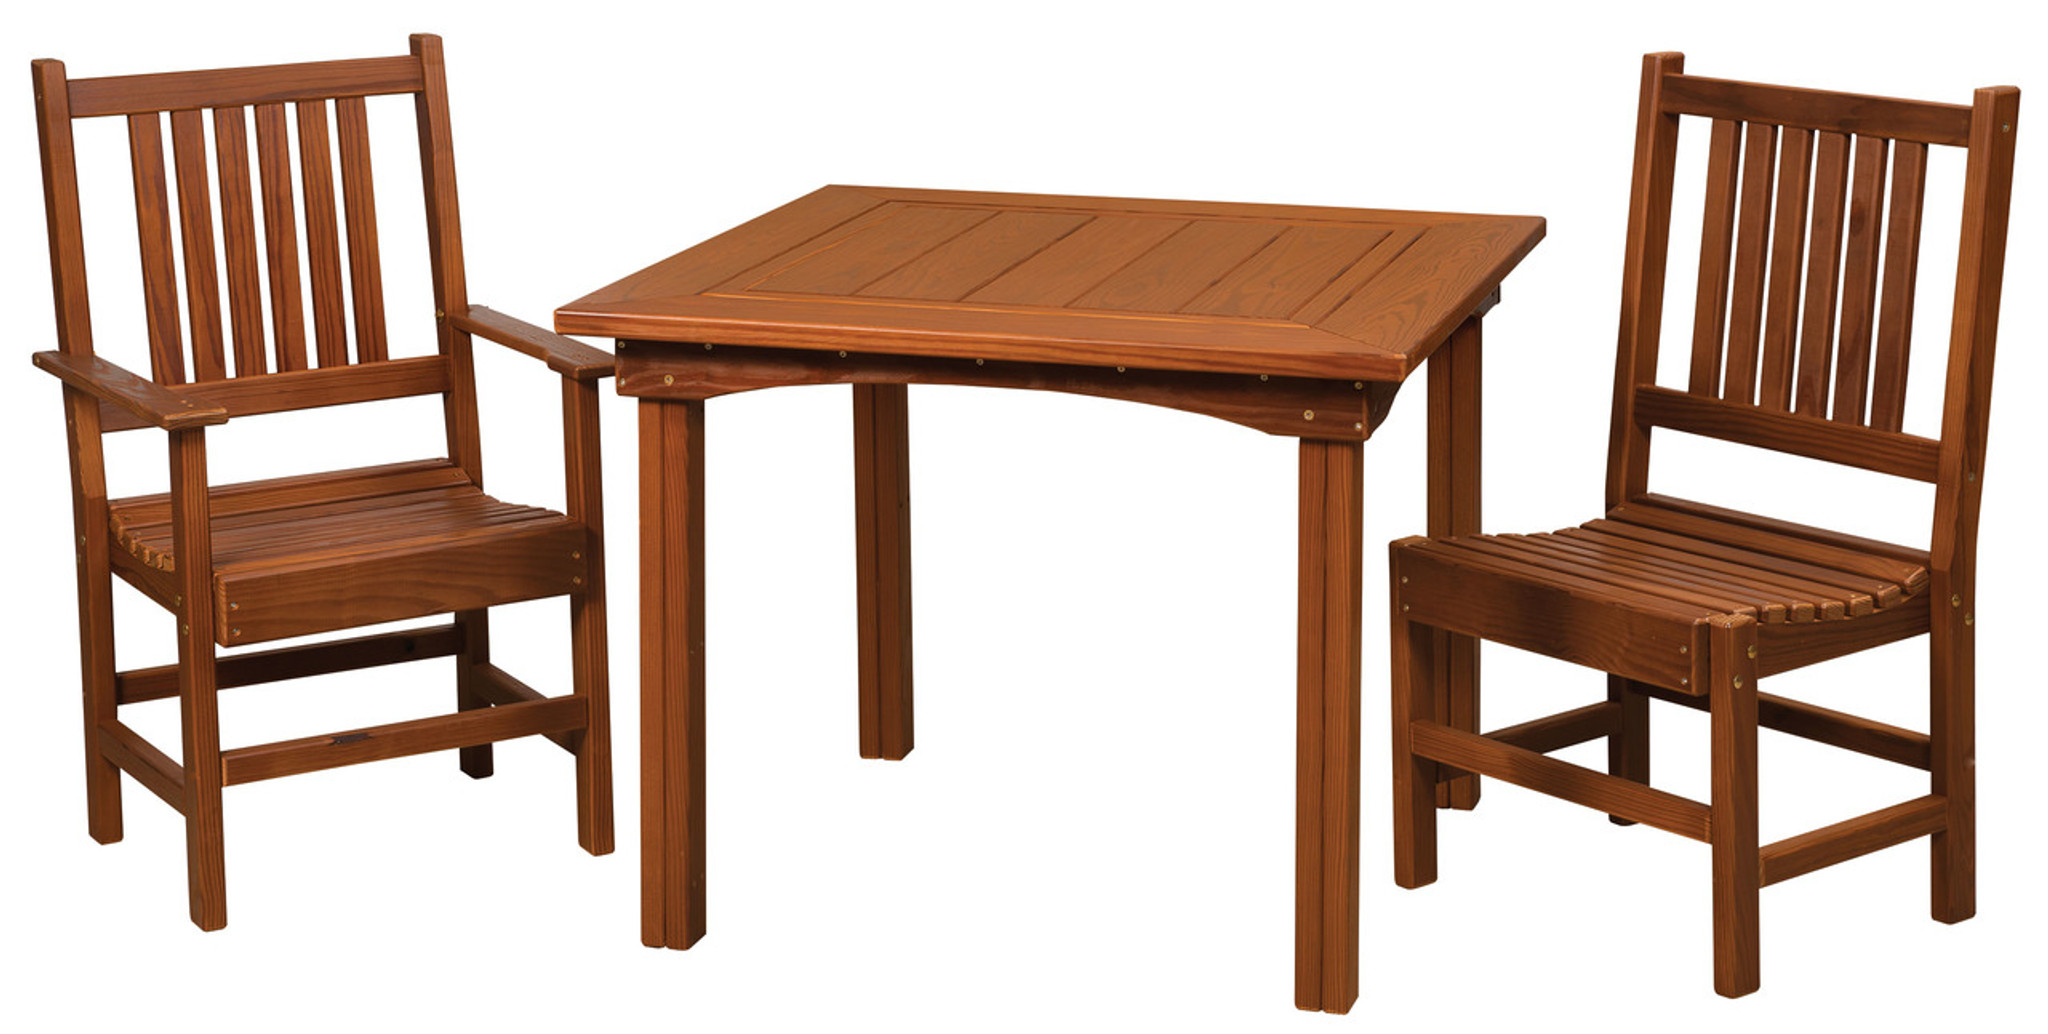 Cedar Square Dining Table & Chairs Set - Mattie Lu